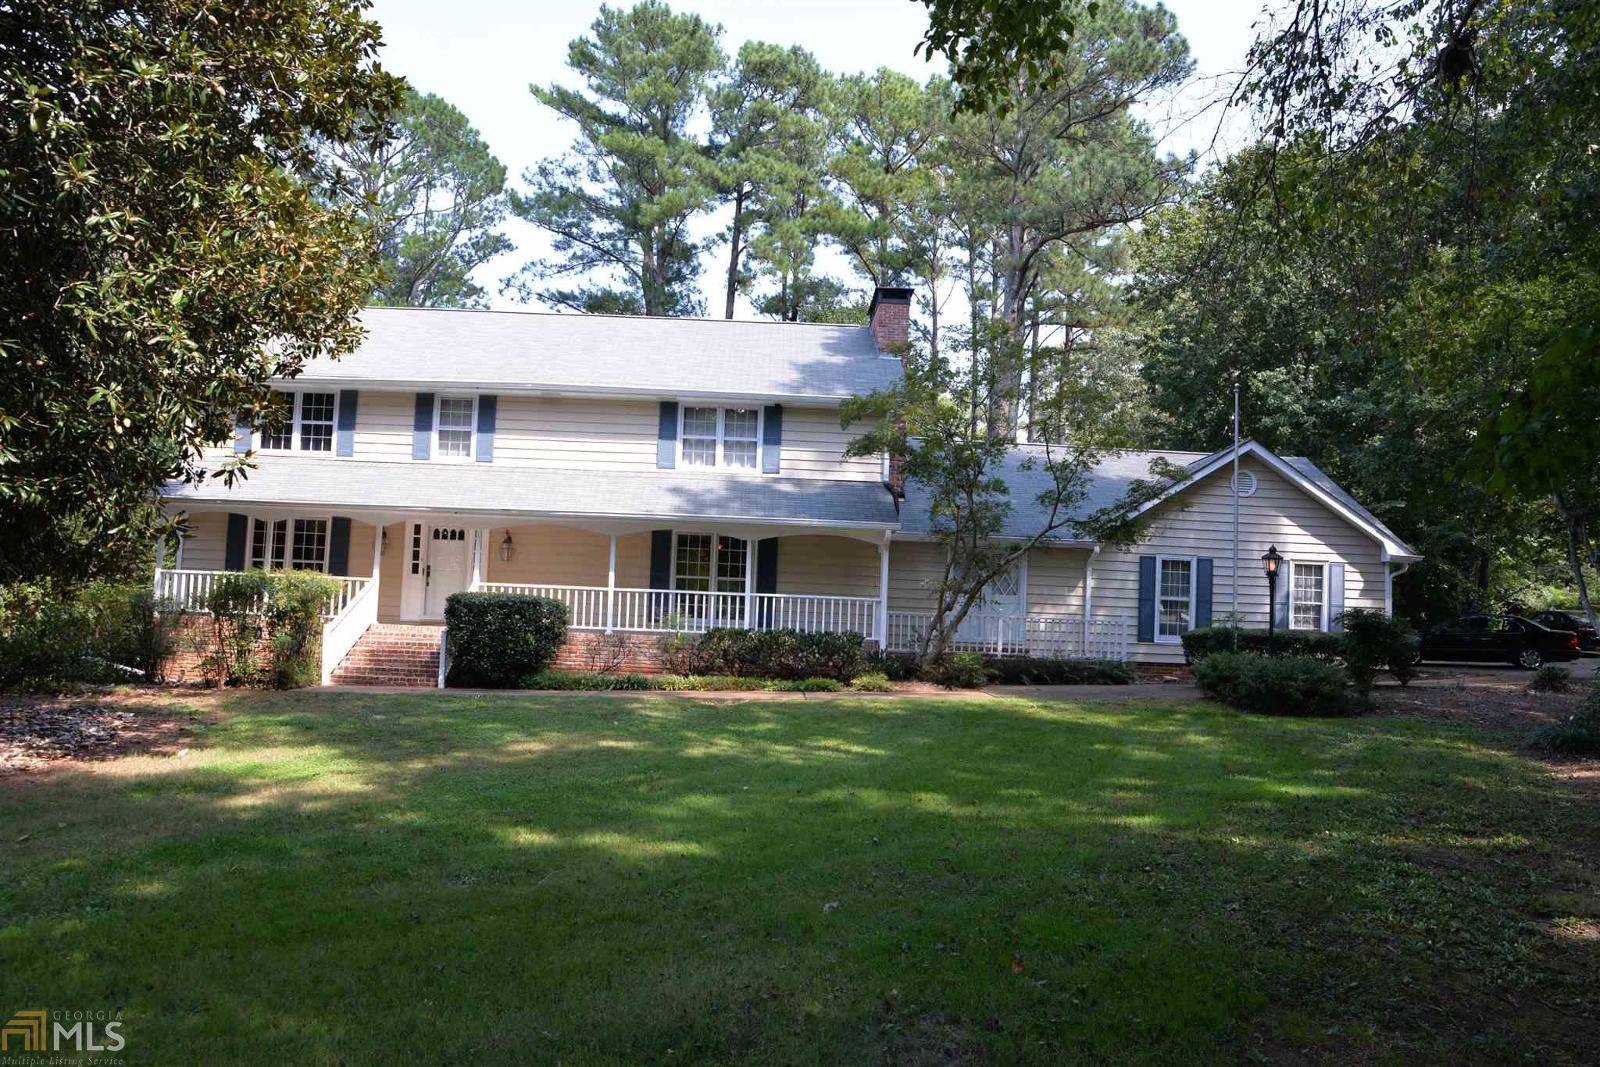 150 Monticello Way Fayetteville Ga Mls 8246333